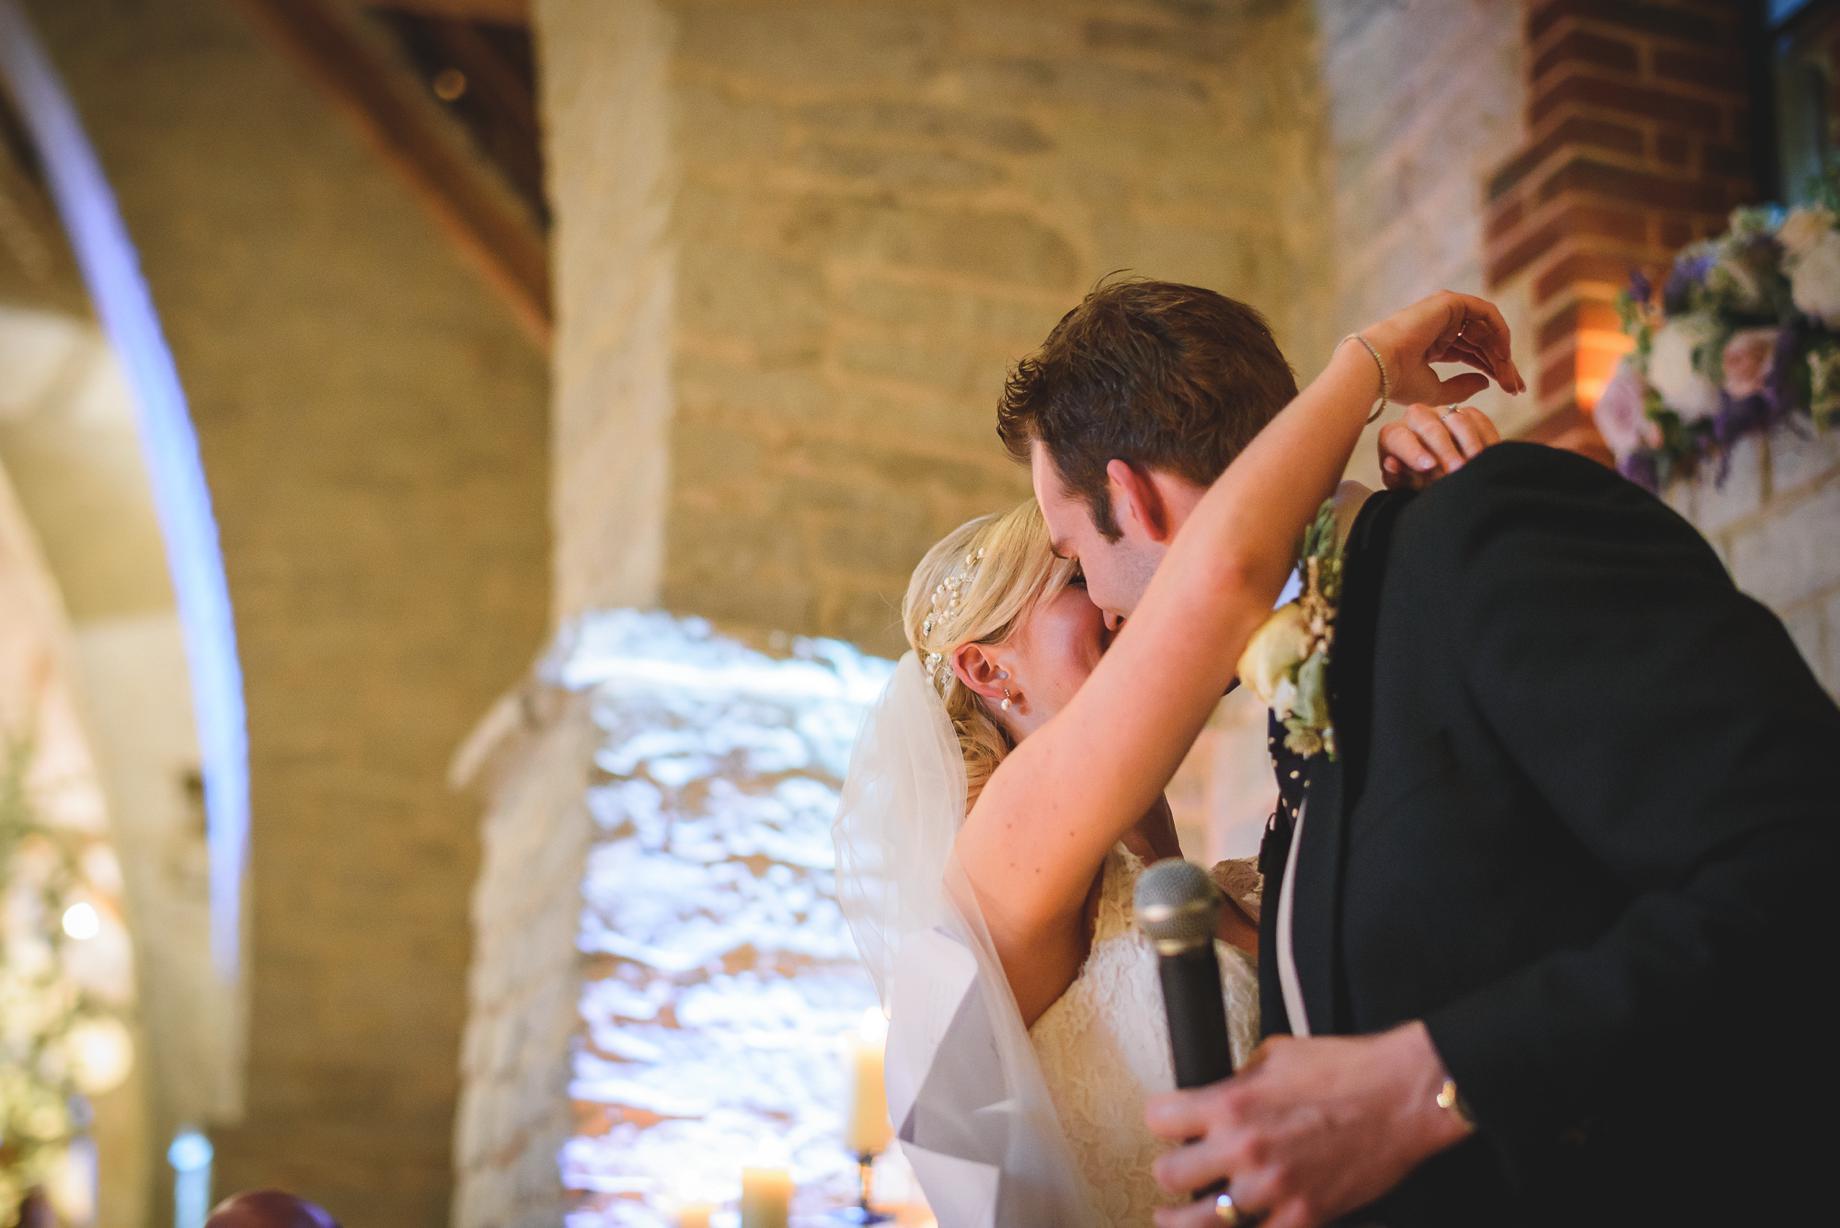 Rozie-and-Tom-Wedding-Slides-198-of-232